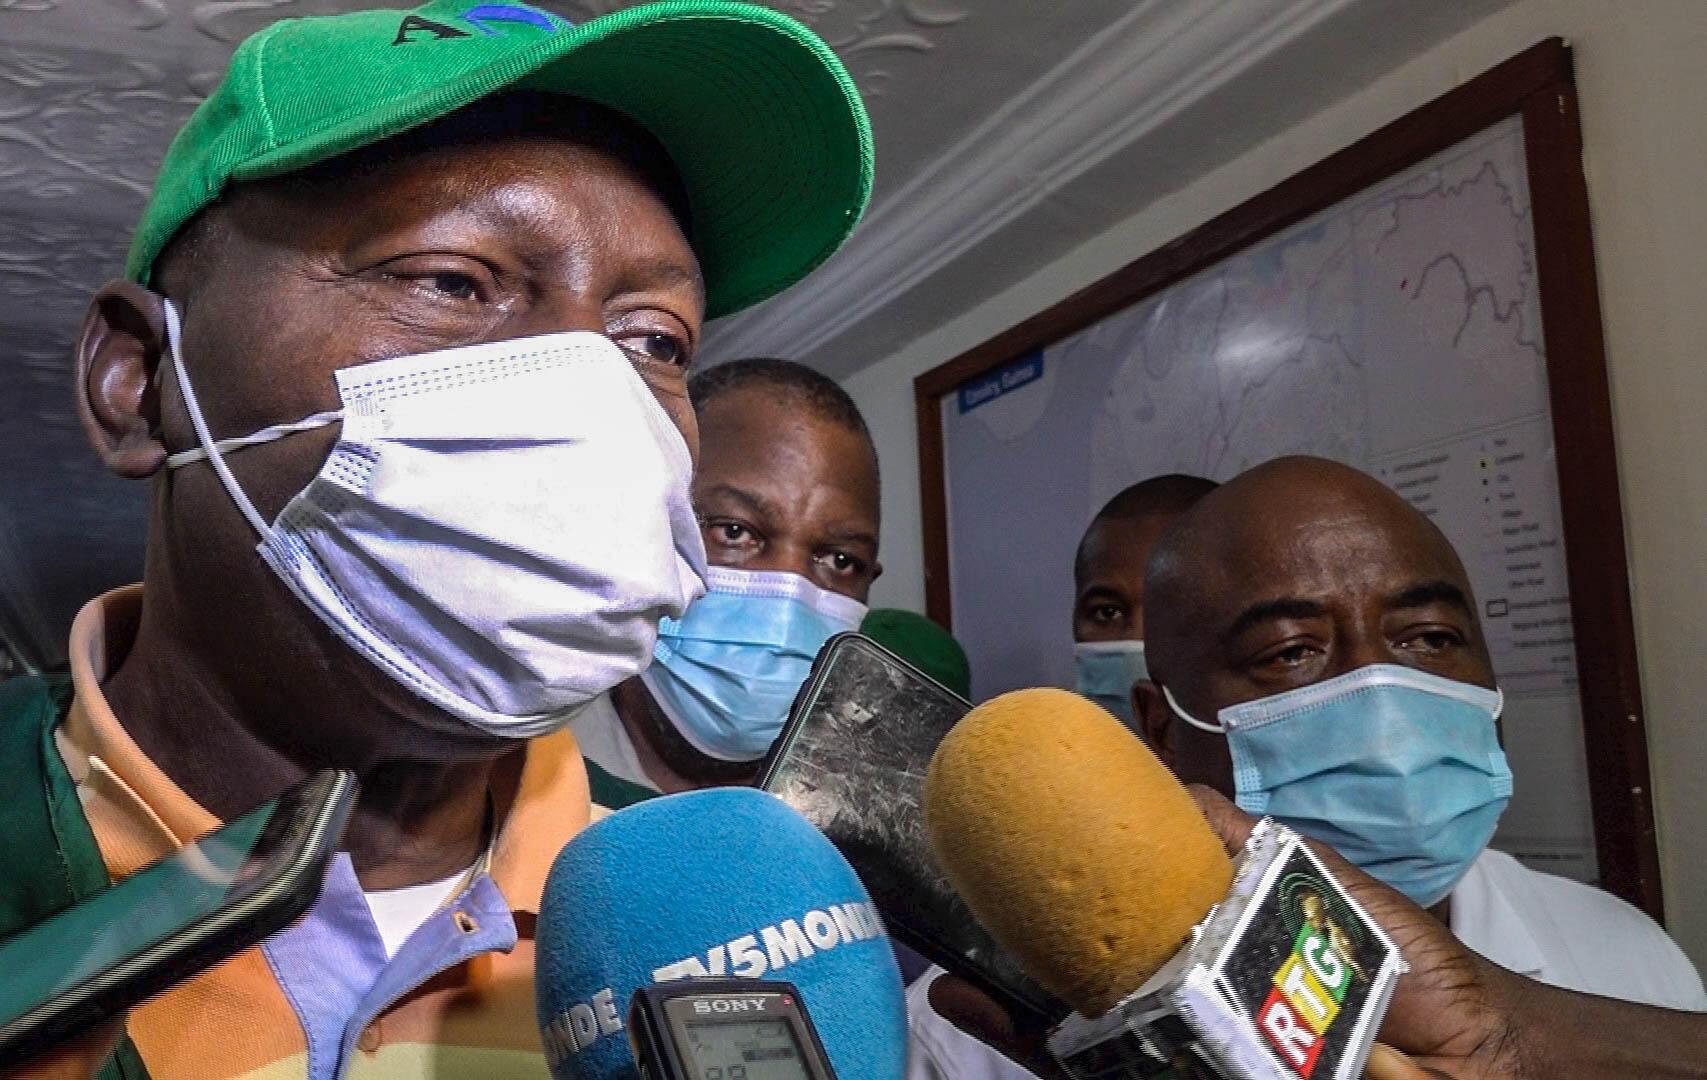 REU EBOLA photo-2 (1) Guinee ebola 14/2/2021